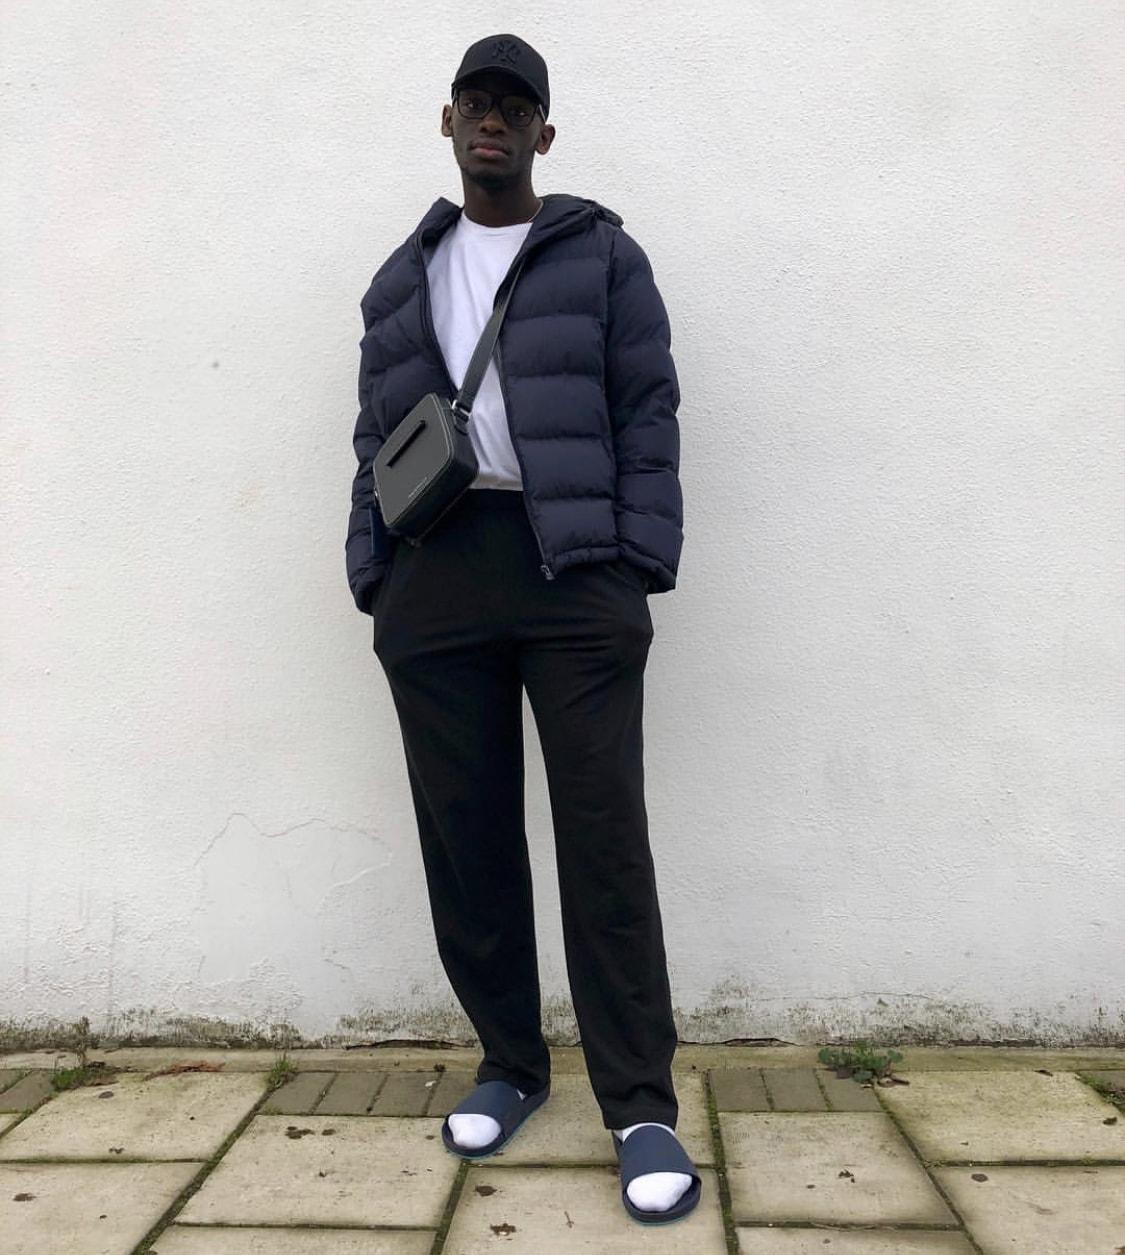 tislohdan stylish people instagram